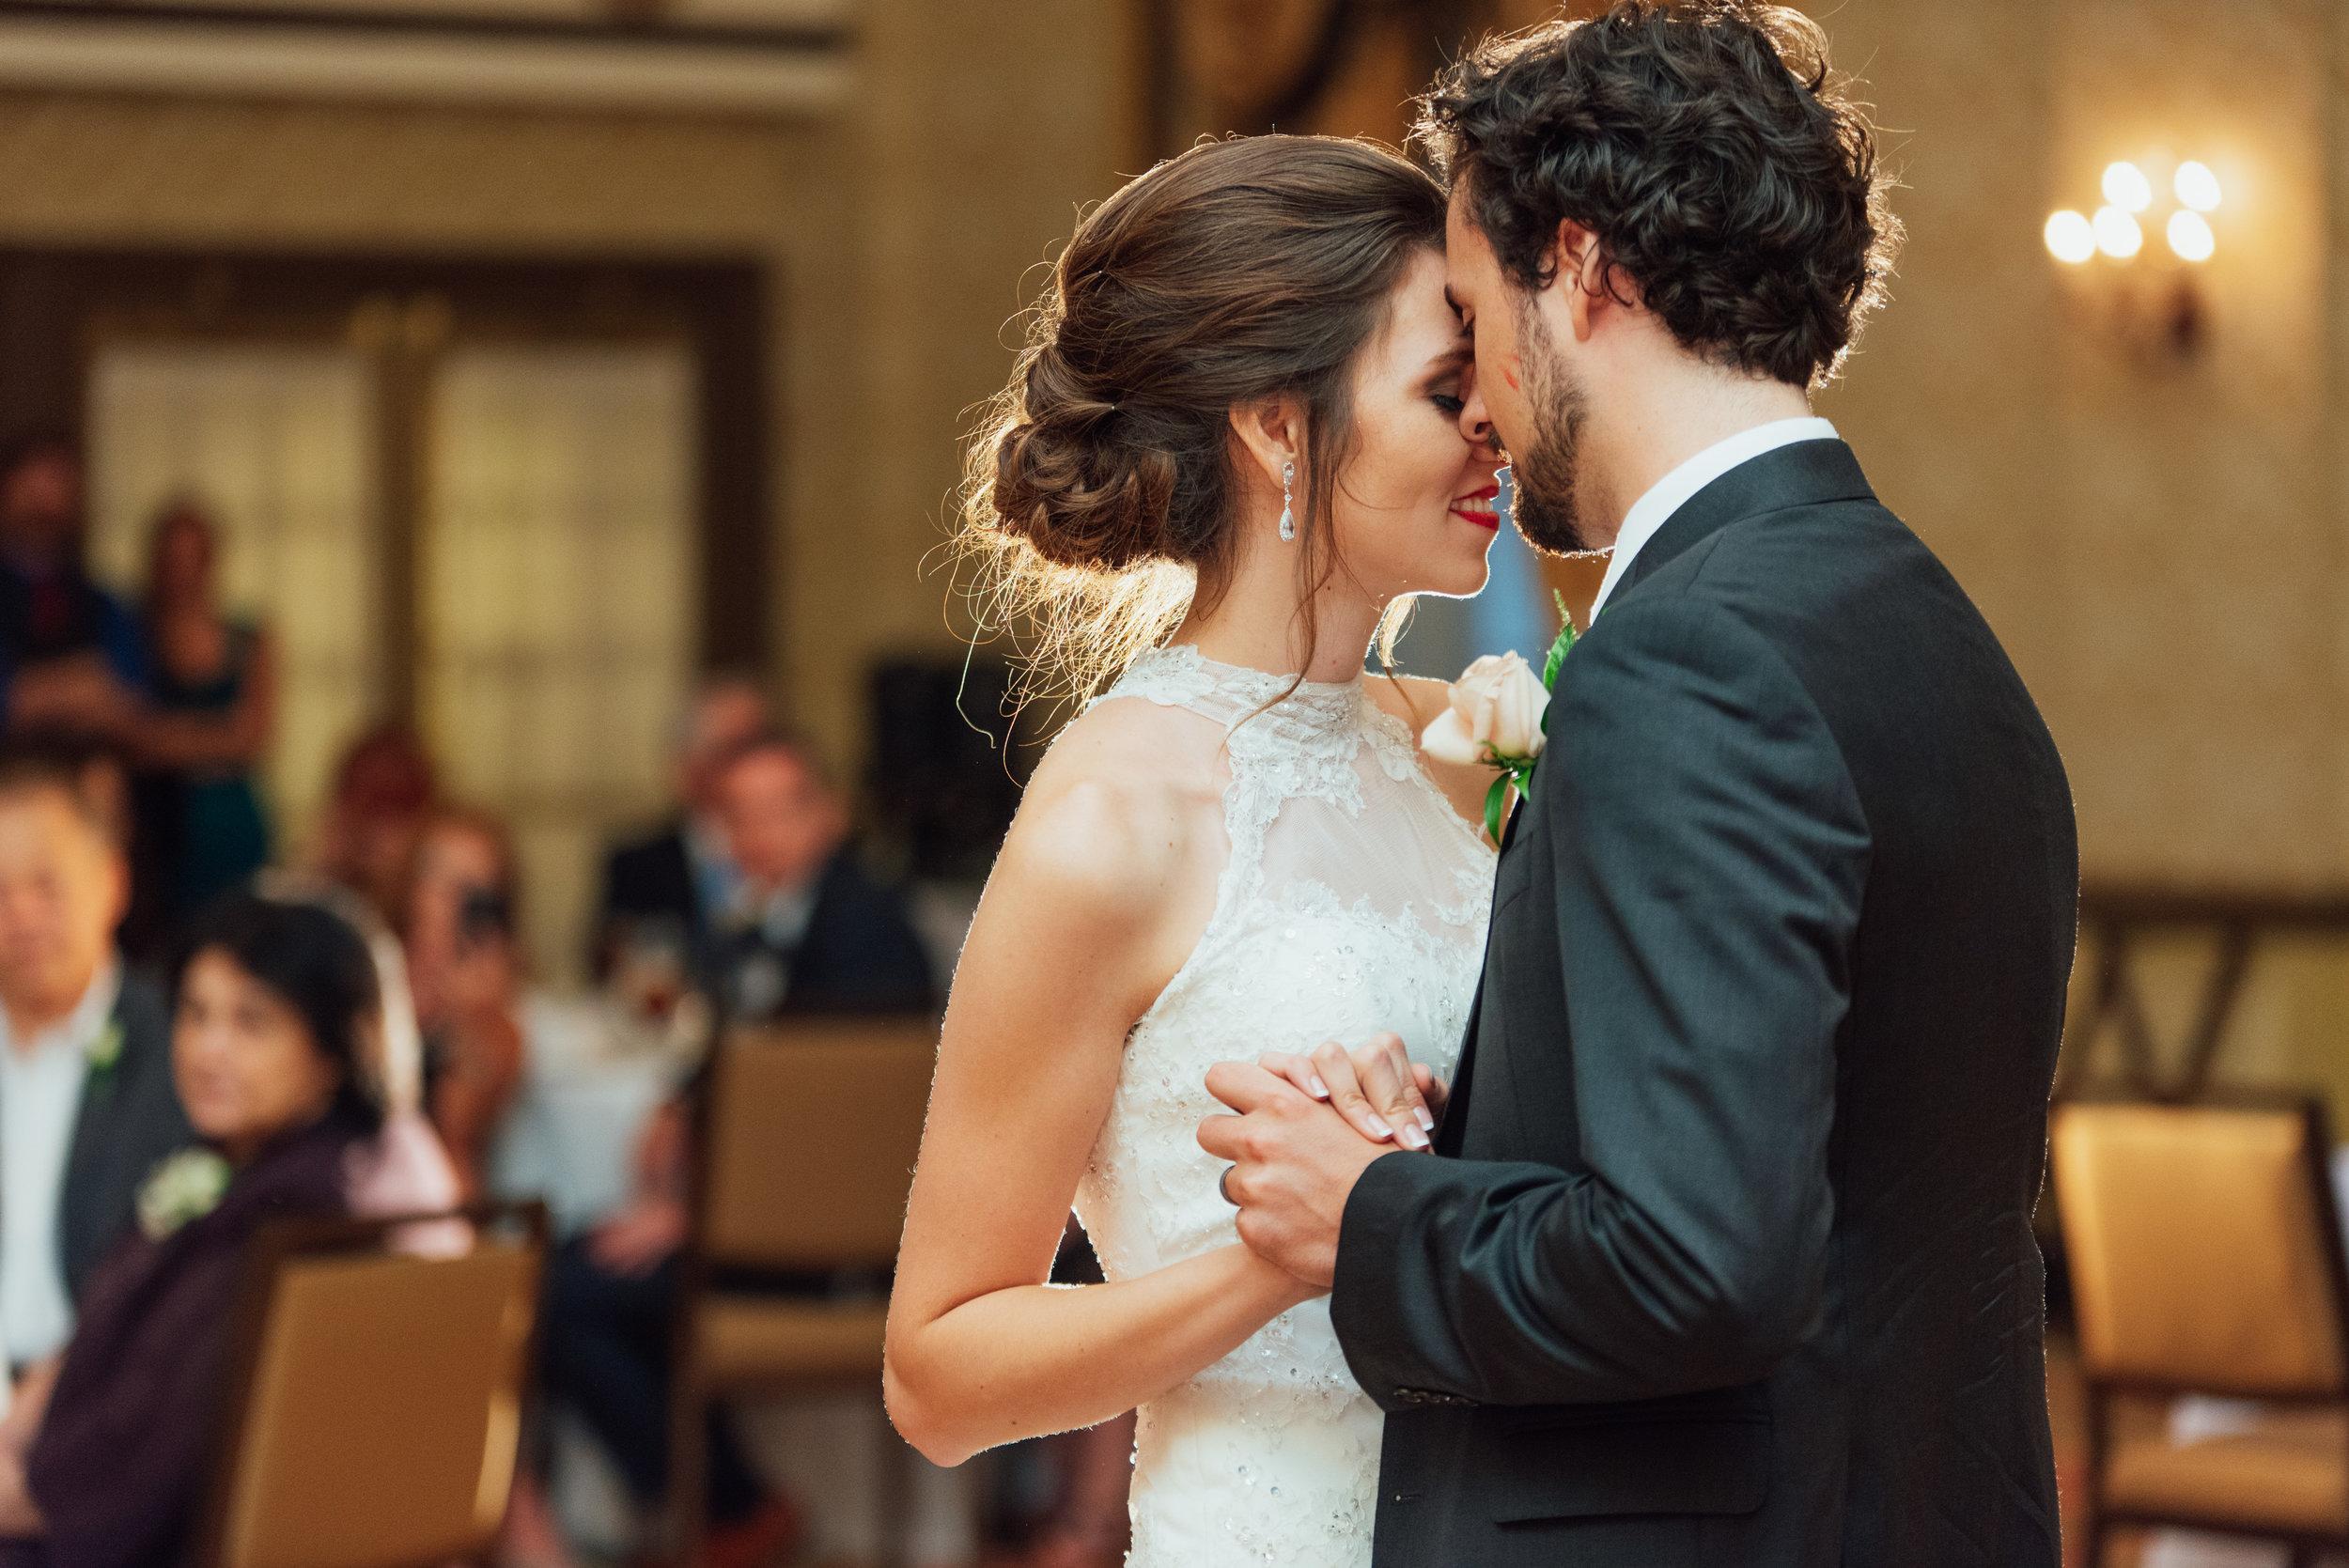 cleland-studios-wedding-photography-52.jpg